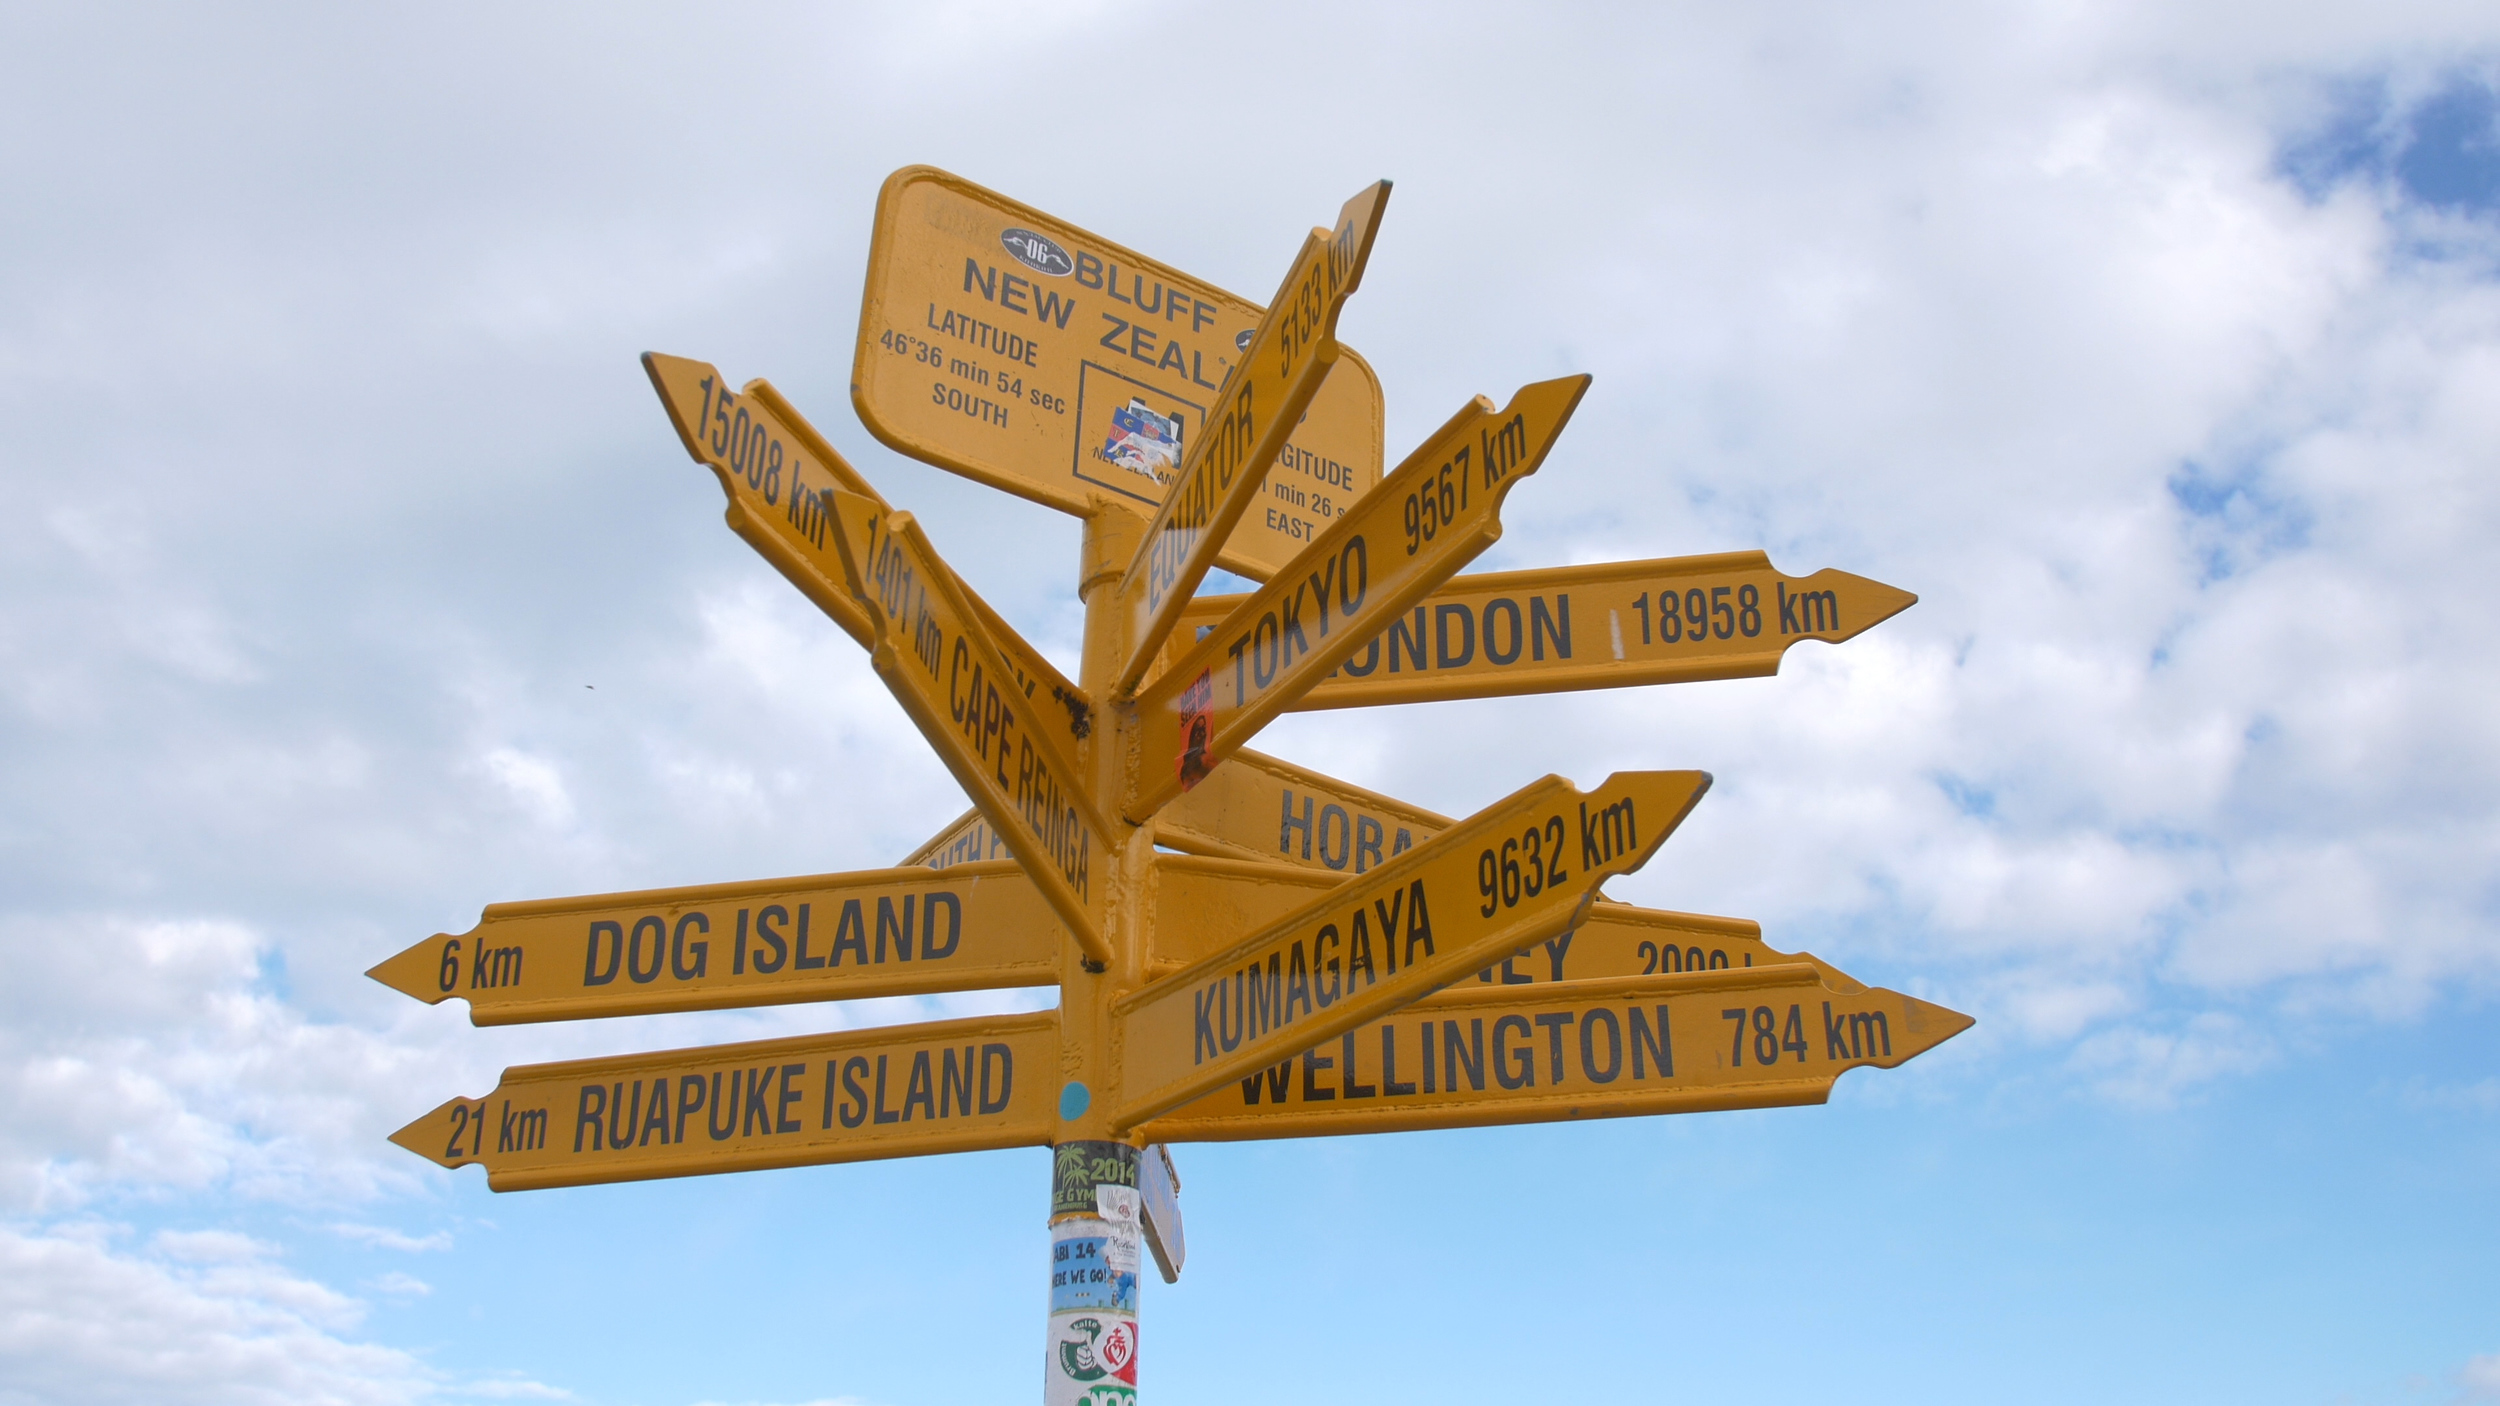 New Zealand locations signpost